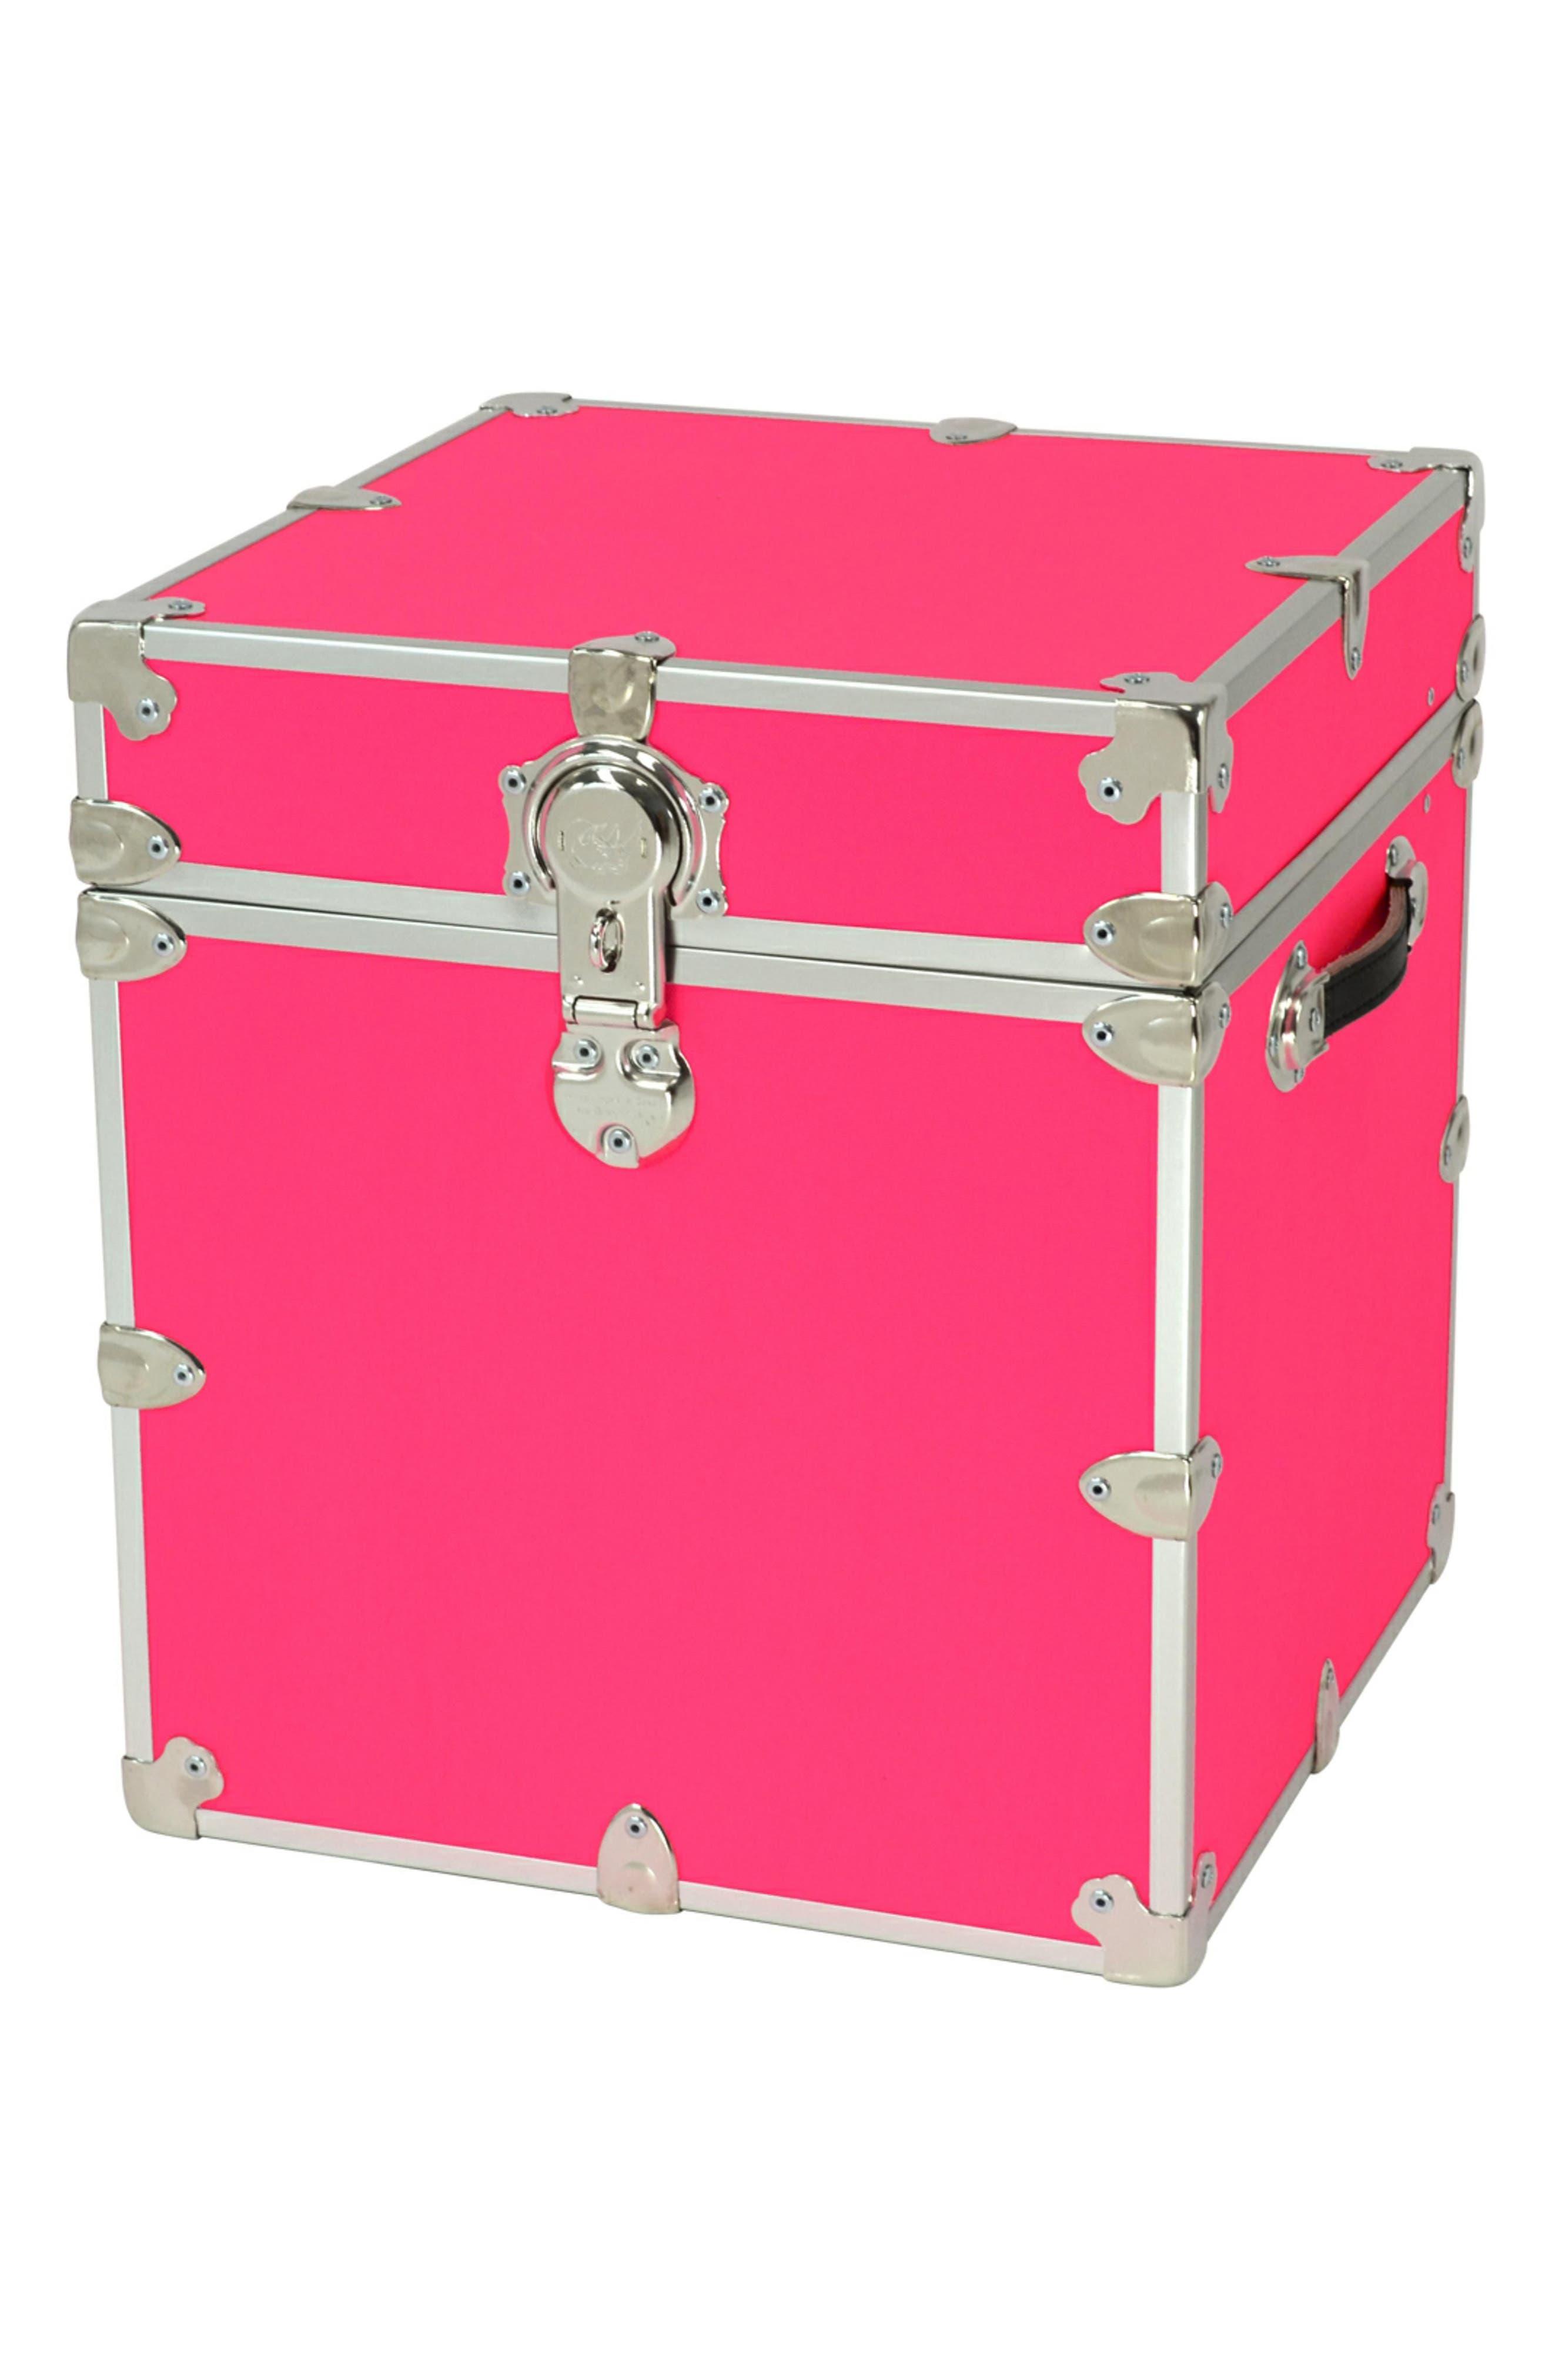 Rhino Trunk & Case Armor Cube Trunk